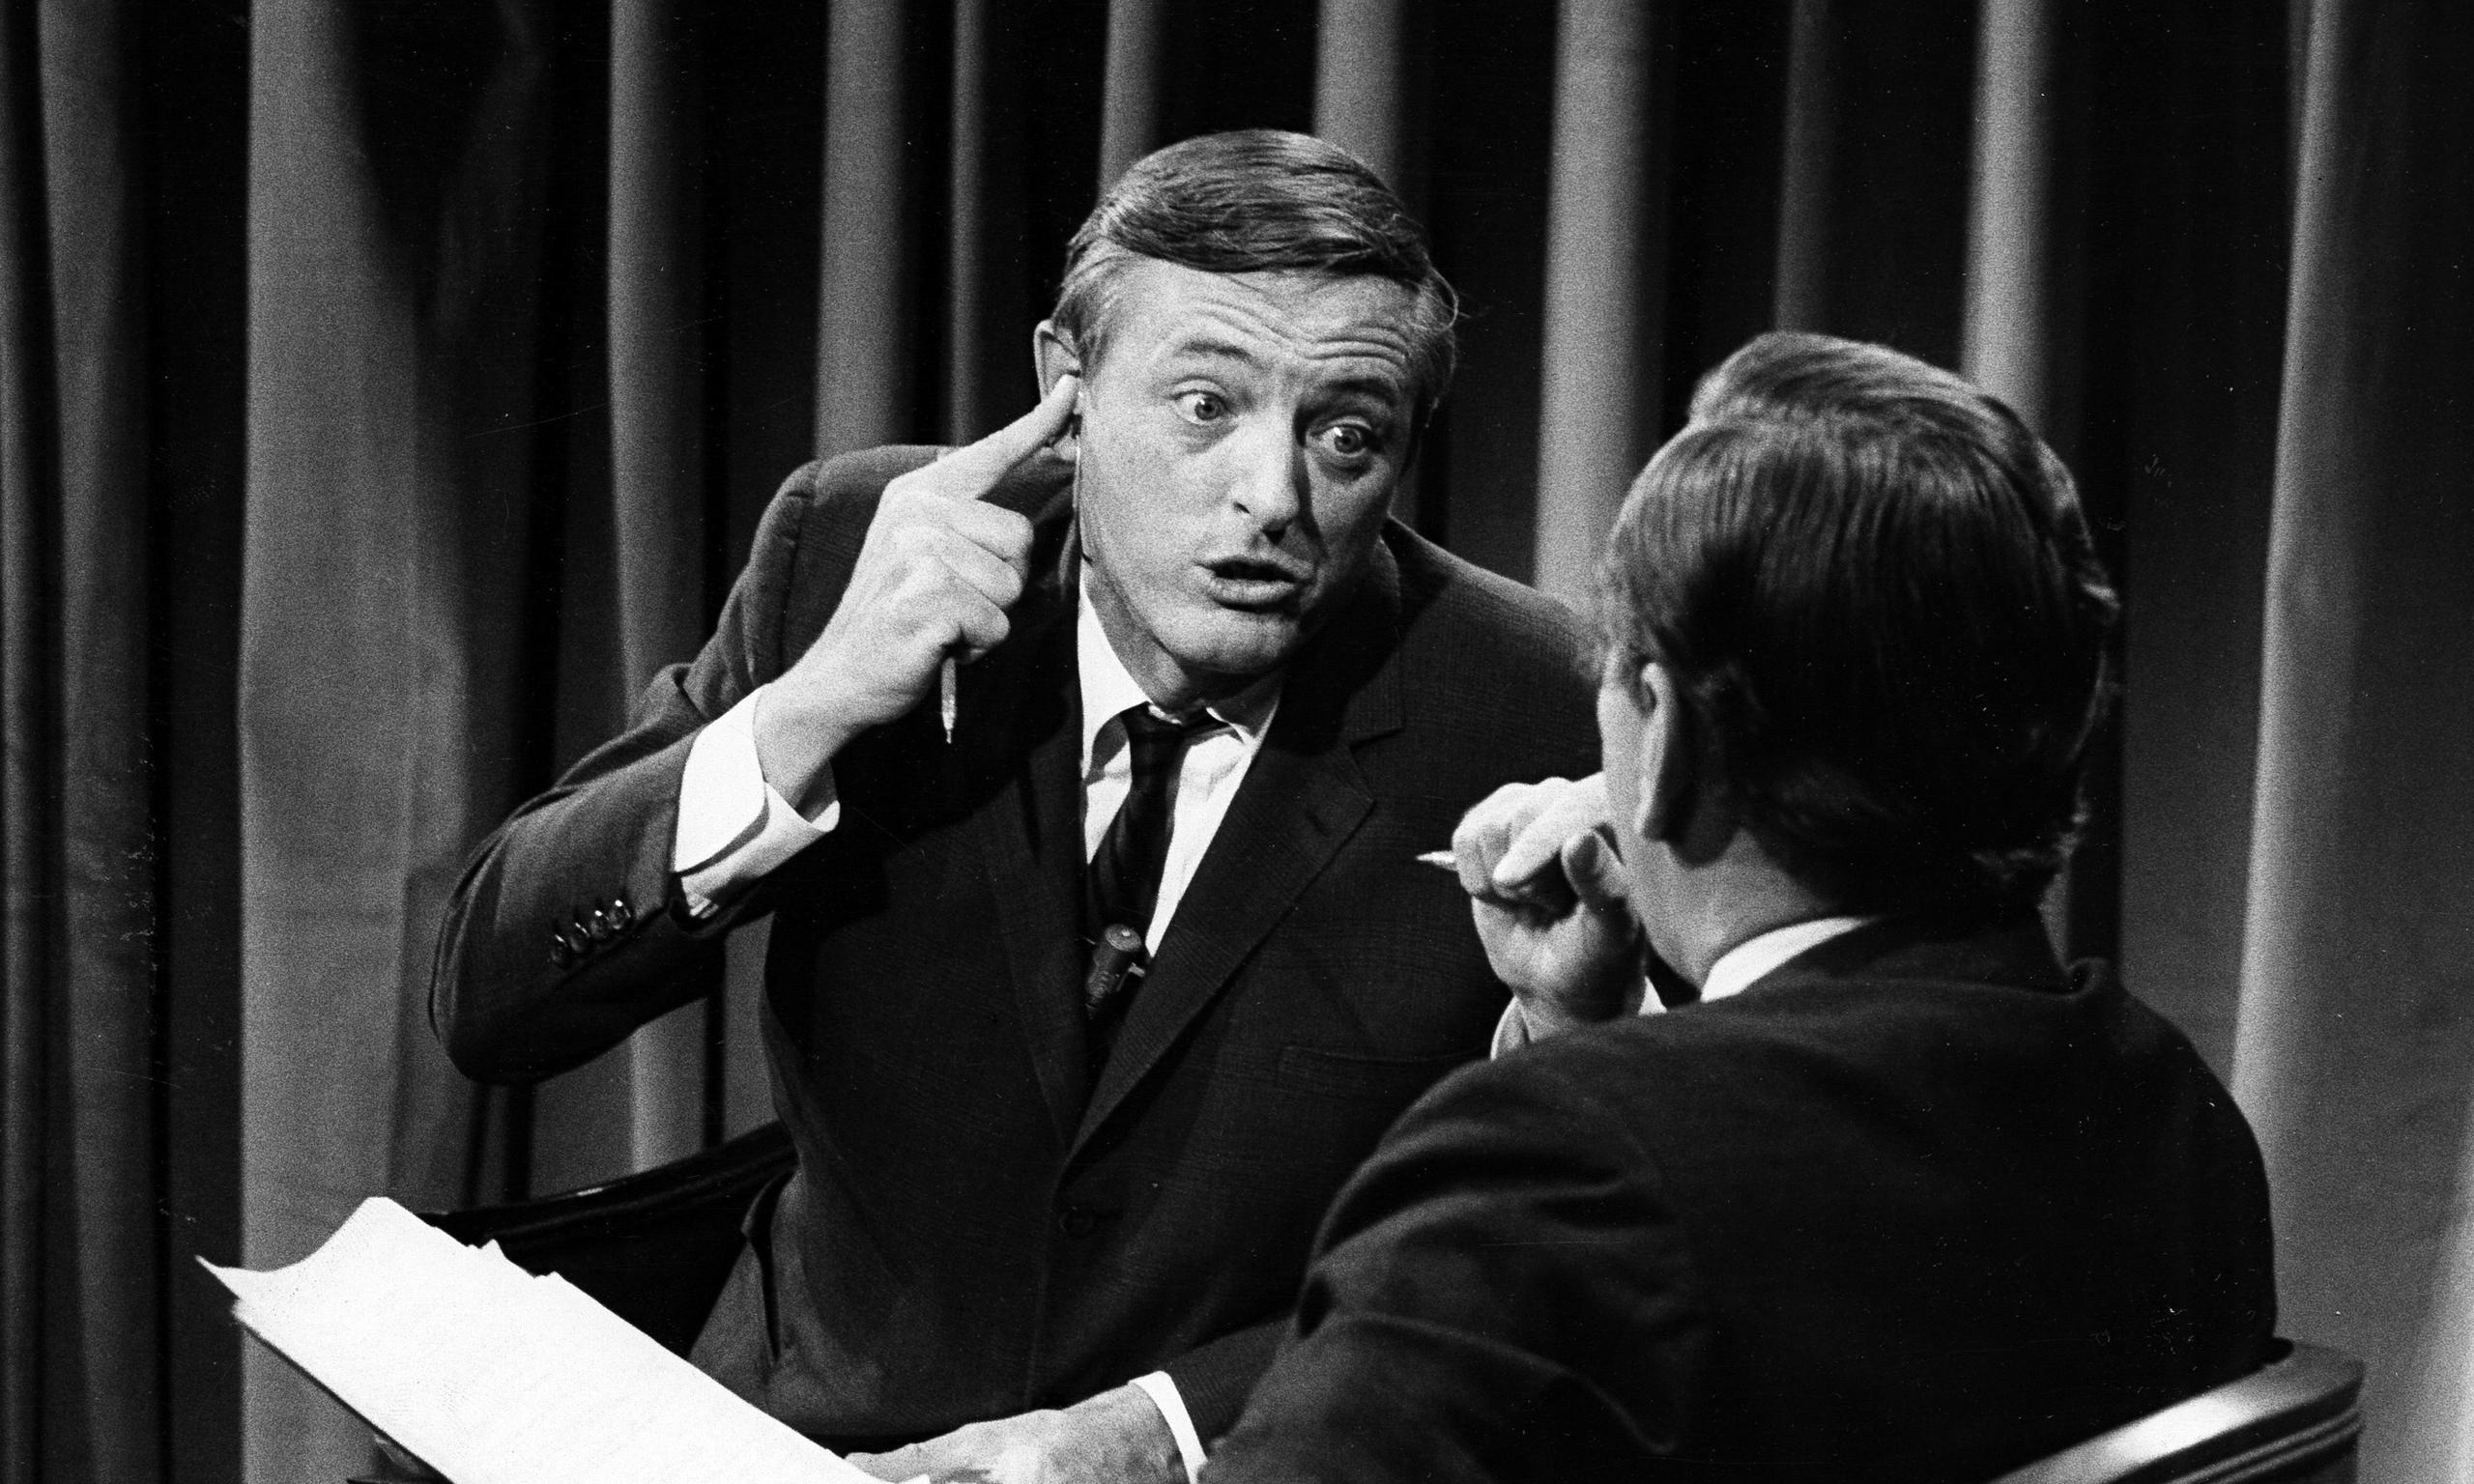 William F. Buckley Jr. shouts at Gore Vidal during the 1968 debates.